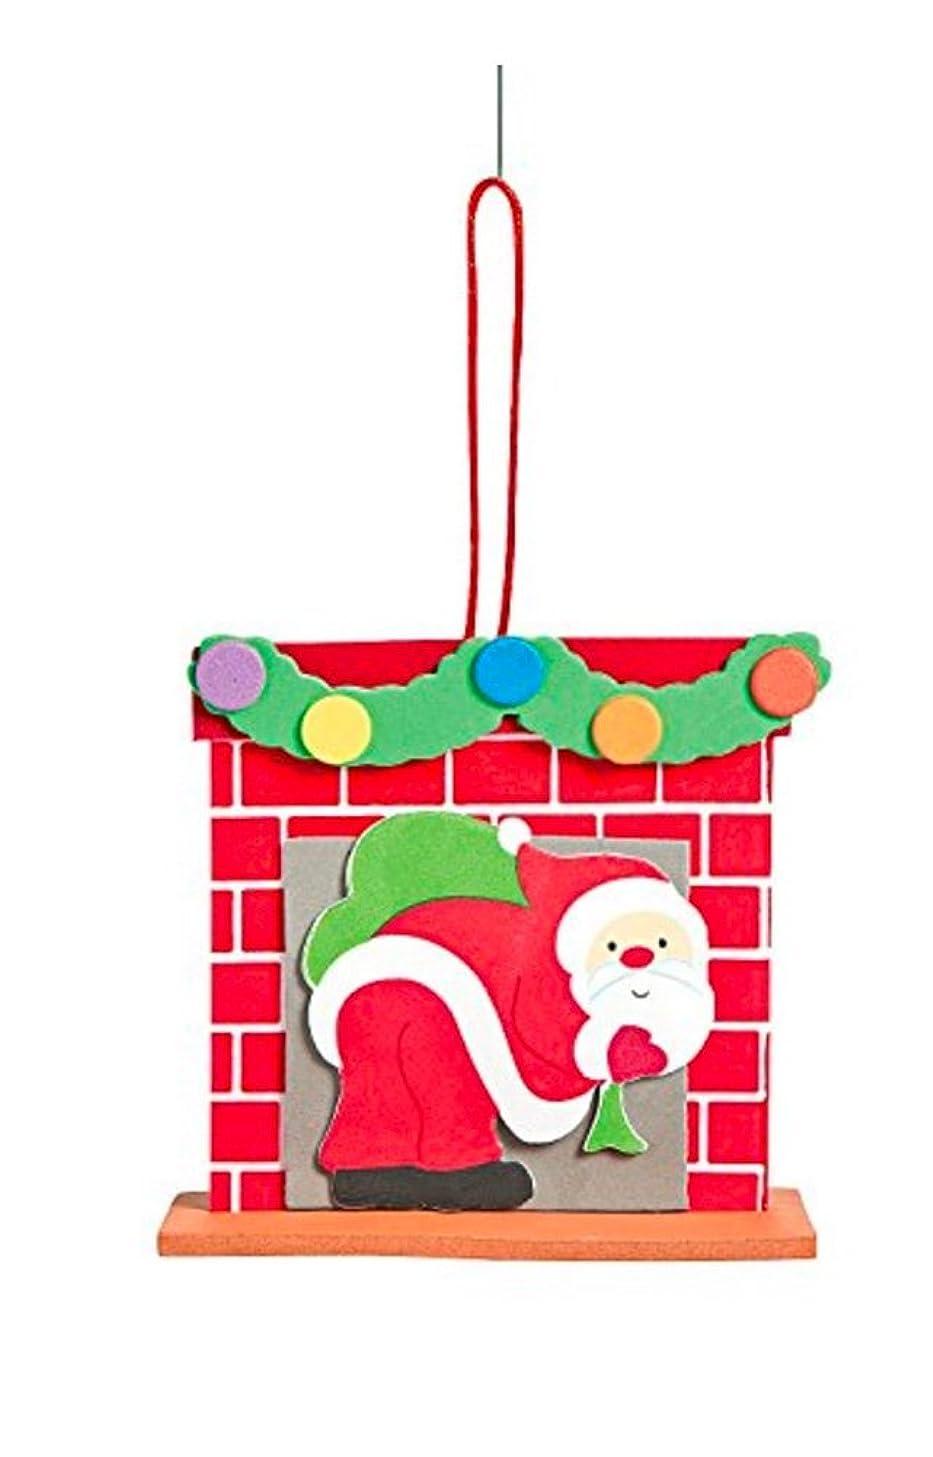 3D Santa Chimney Ornament Foam Craft Kit-makes 12